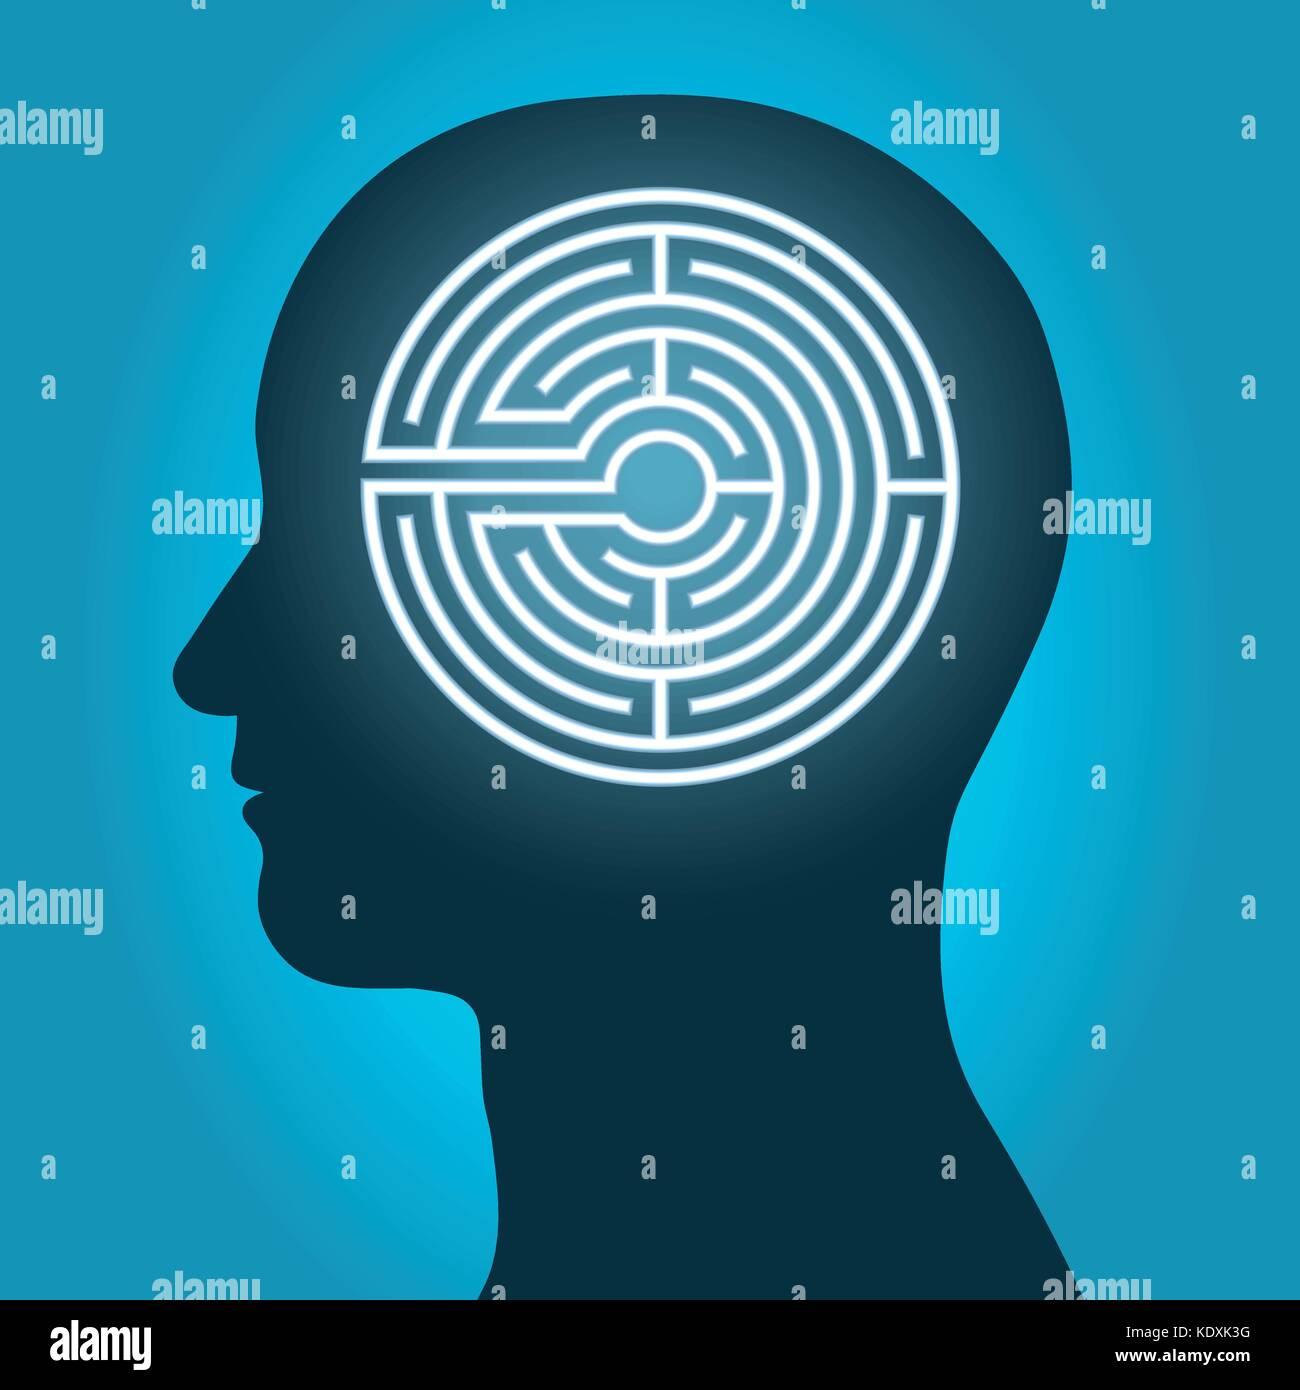 Head with mind maze, labyrinth depicting meditation. Vector illustration. - Stock Vector